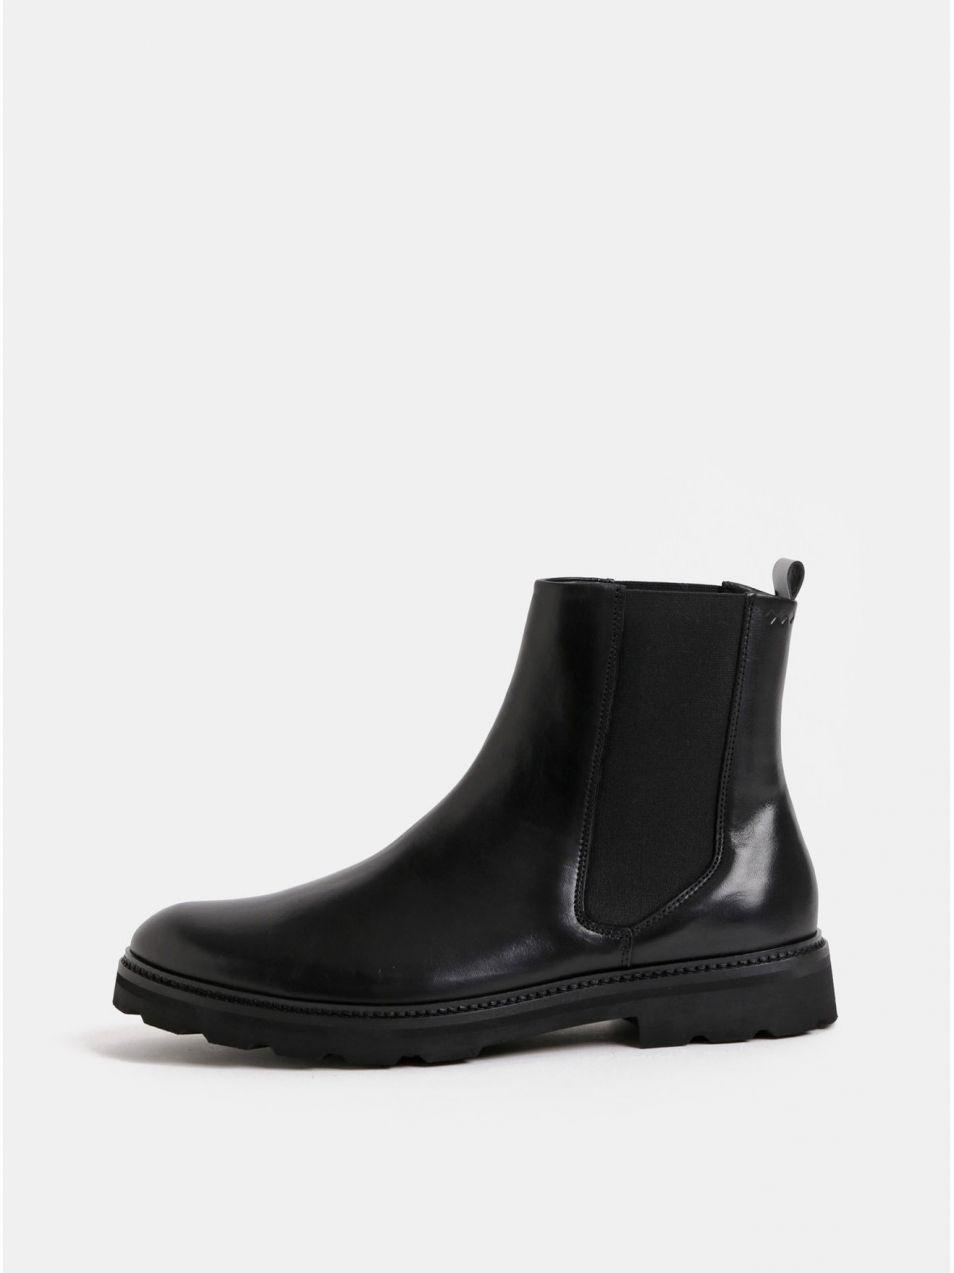 58d90821fff6 Čierne pánske kožené chelsea topánky Royal RepubliQ značky Royal ...